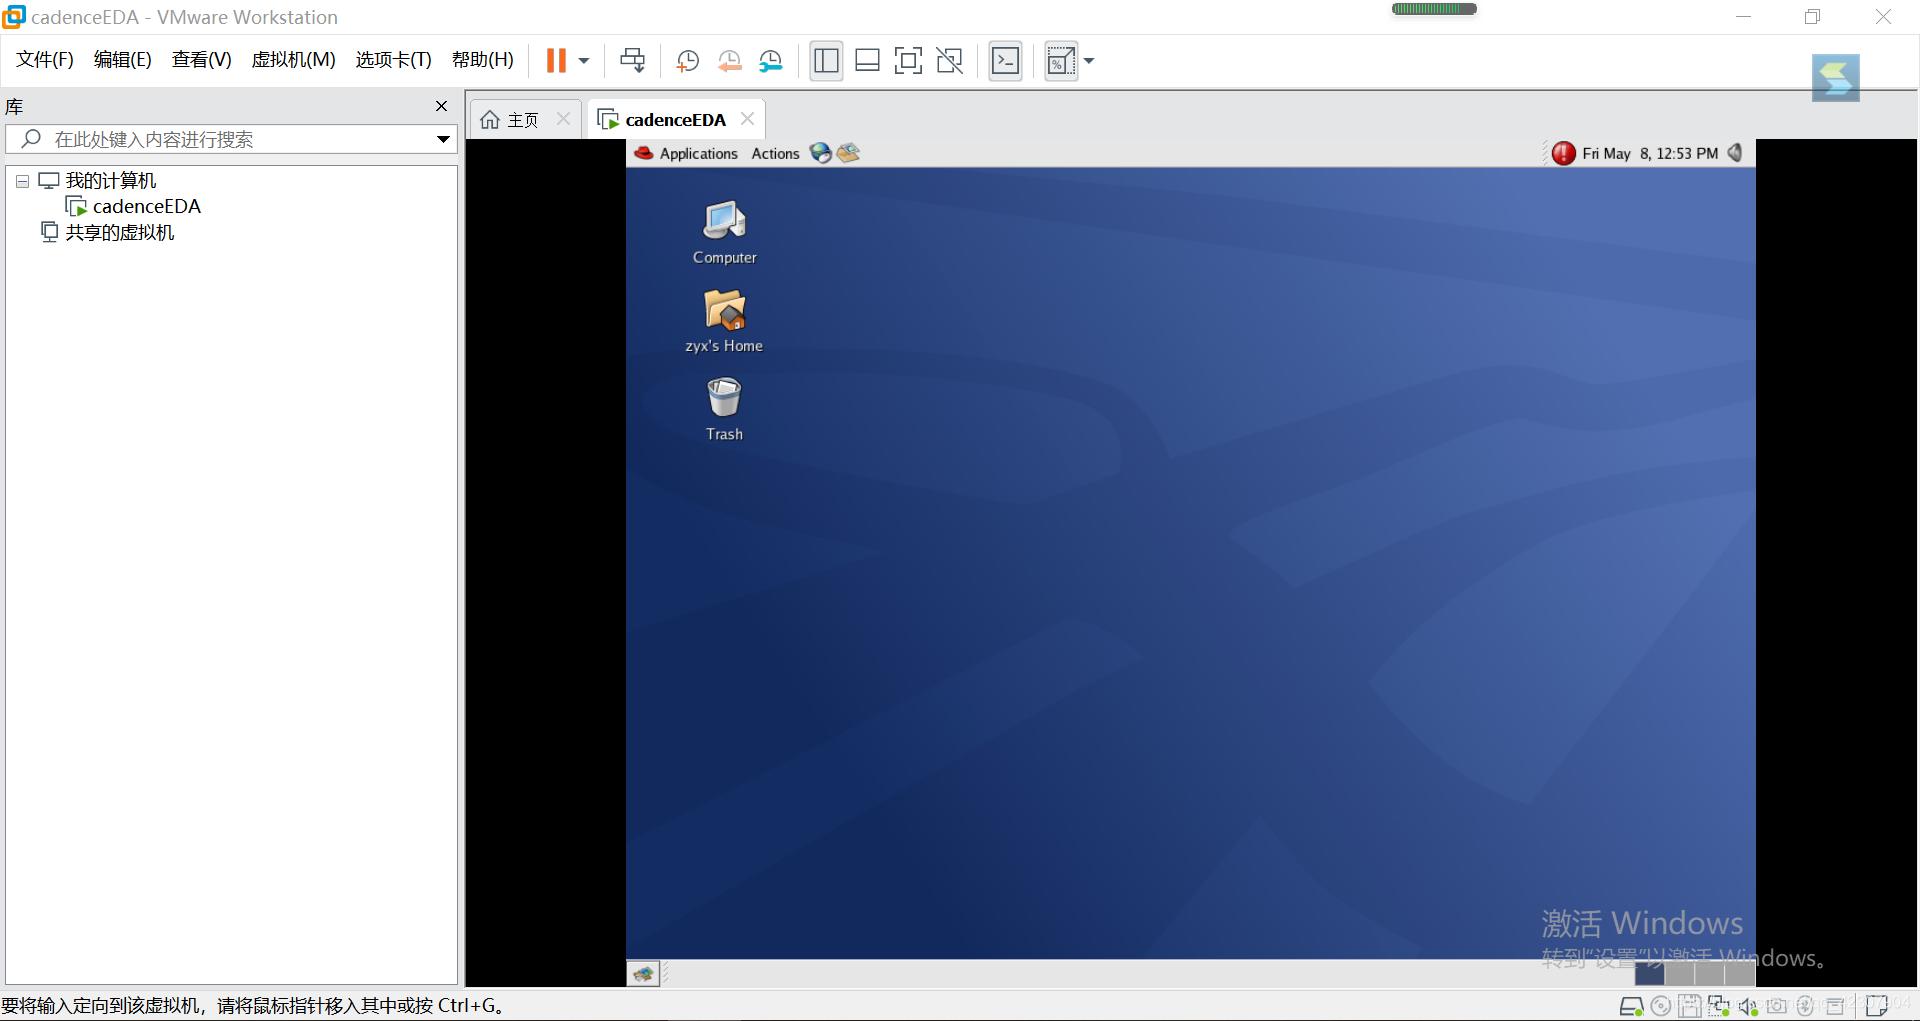 图3: Linux虚拟机主界面